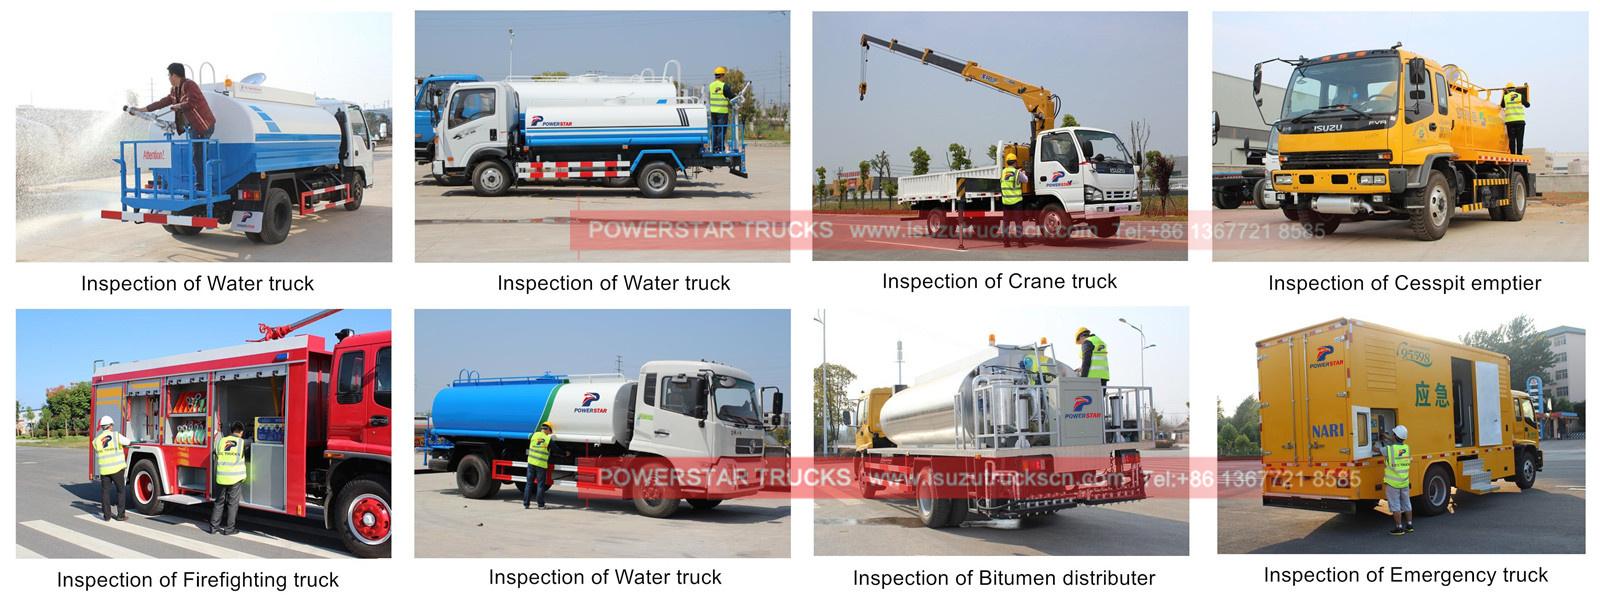 customer build Isuzu tanker trucks for inspectioin and training